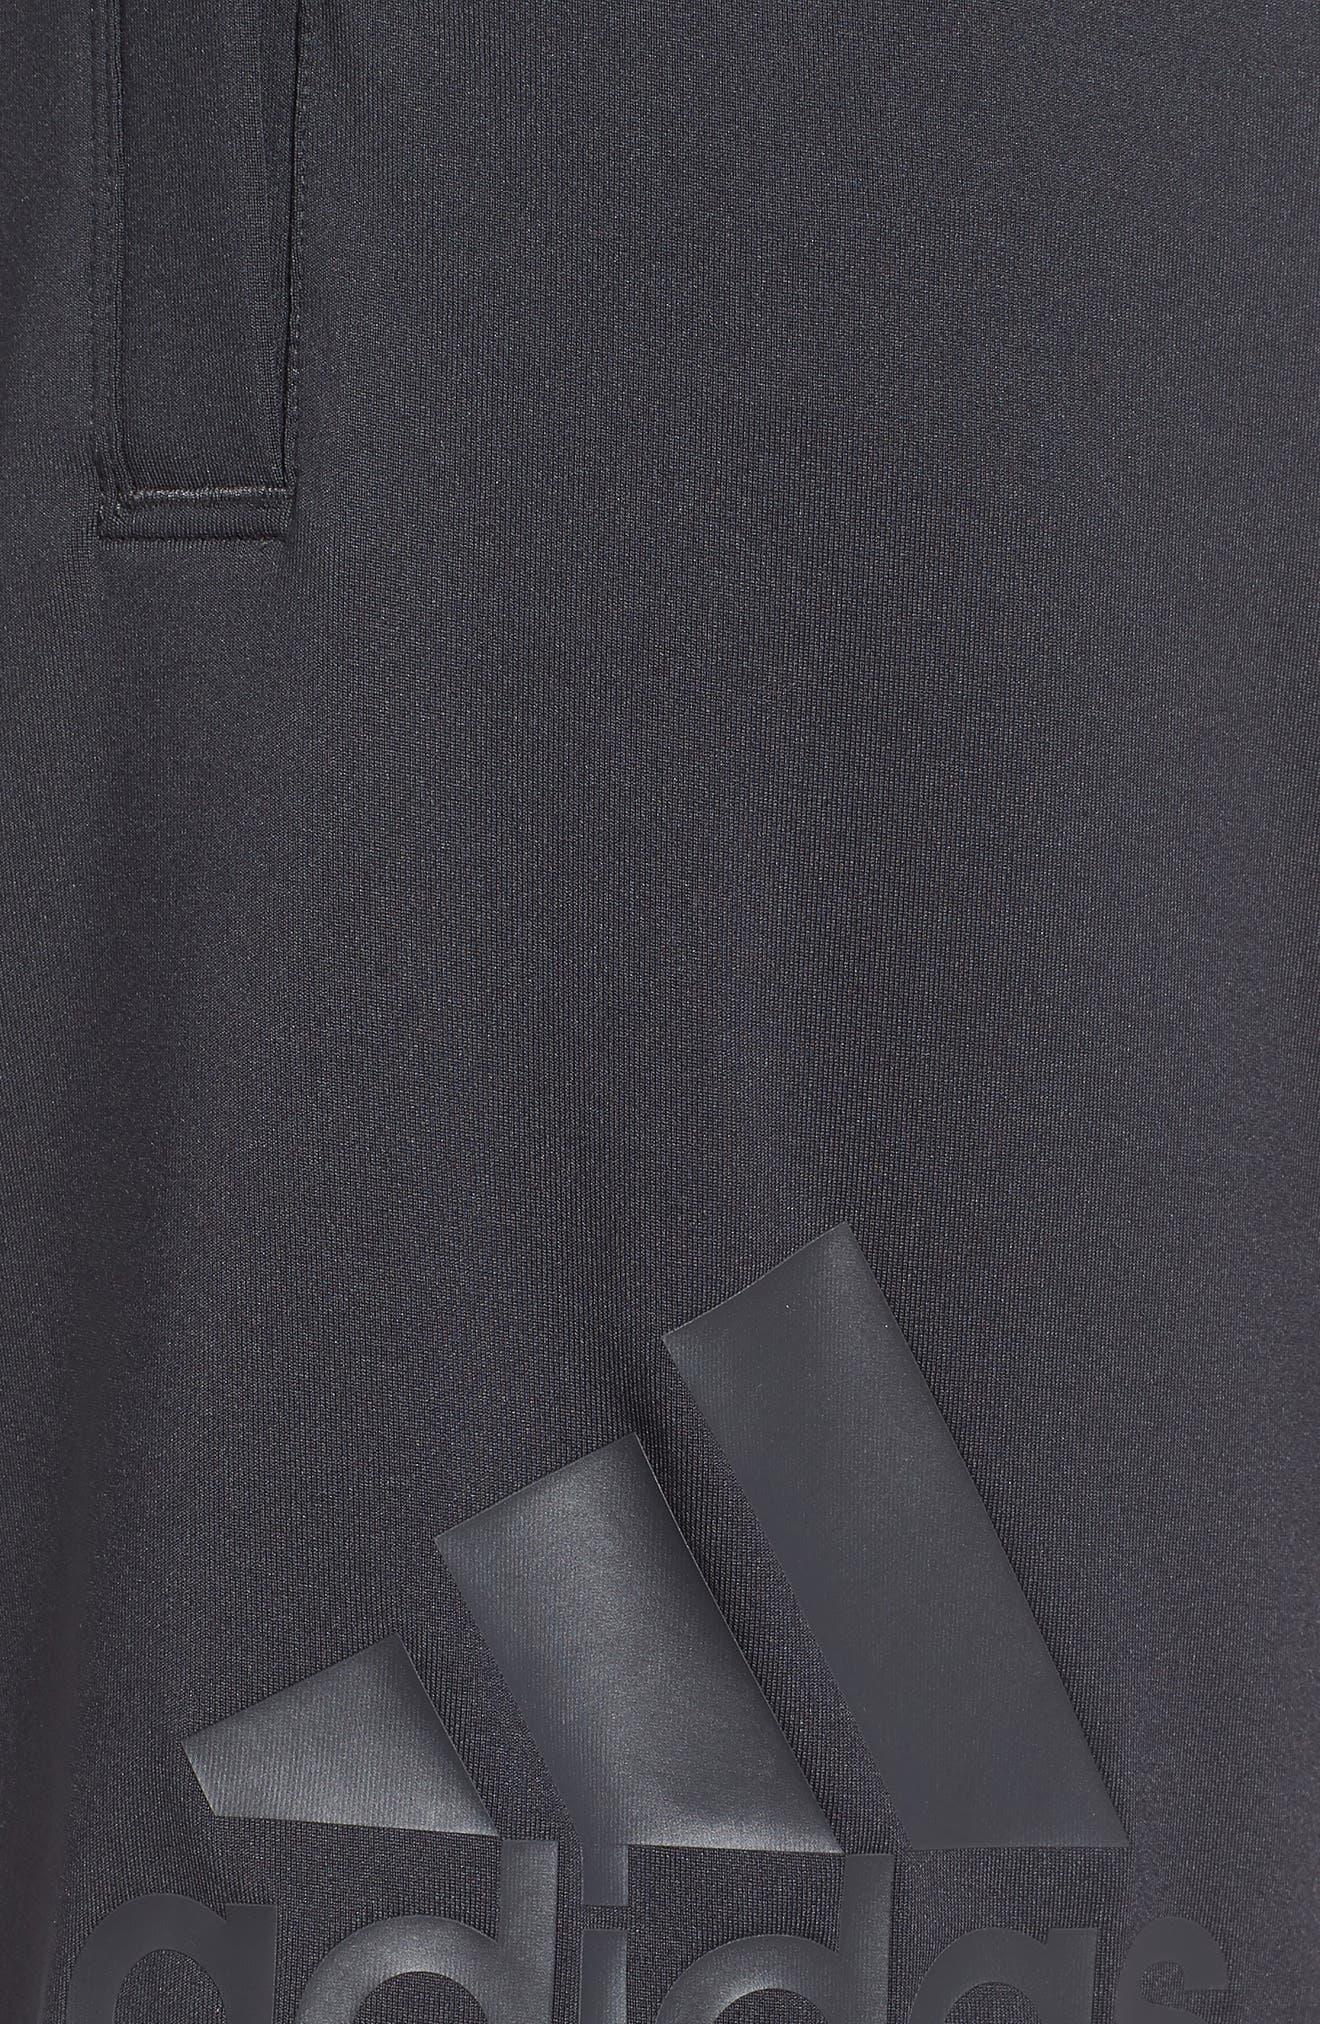 SB Hype Icon Shorts,                             Alternate thumbnail 4, color,                             CARBON/ BLACK